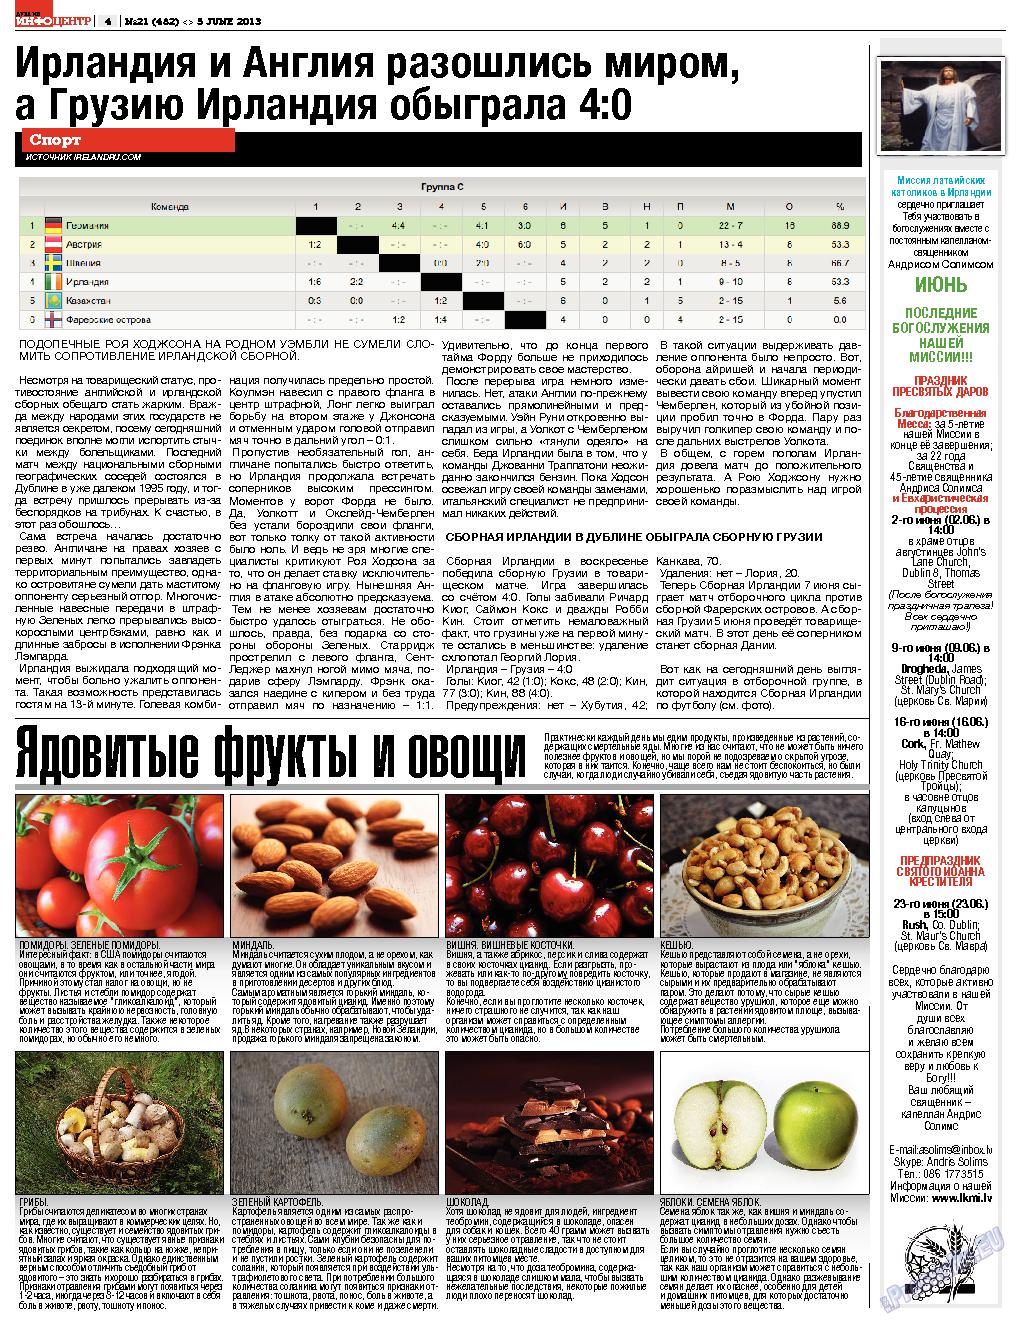 Дублин инфоцентр (газета). 2013 год, номер 21, стр. 4